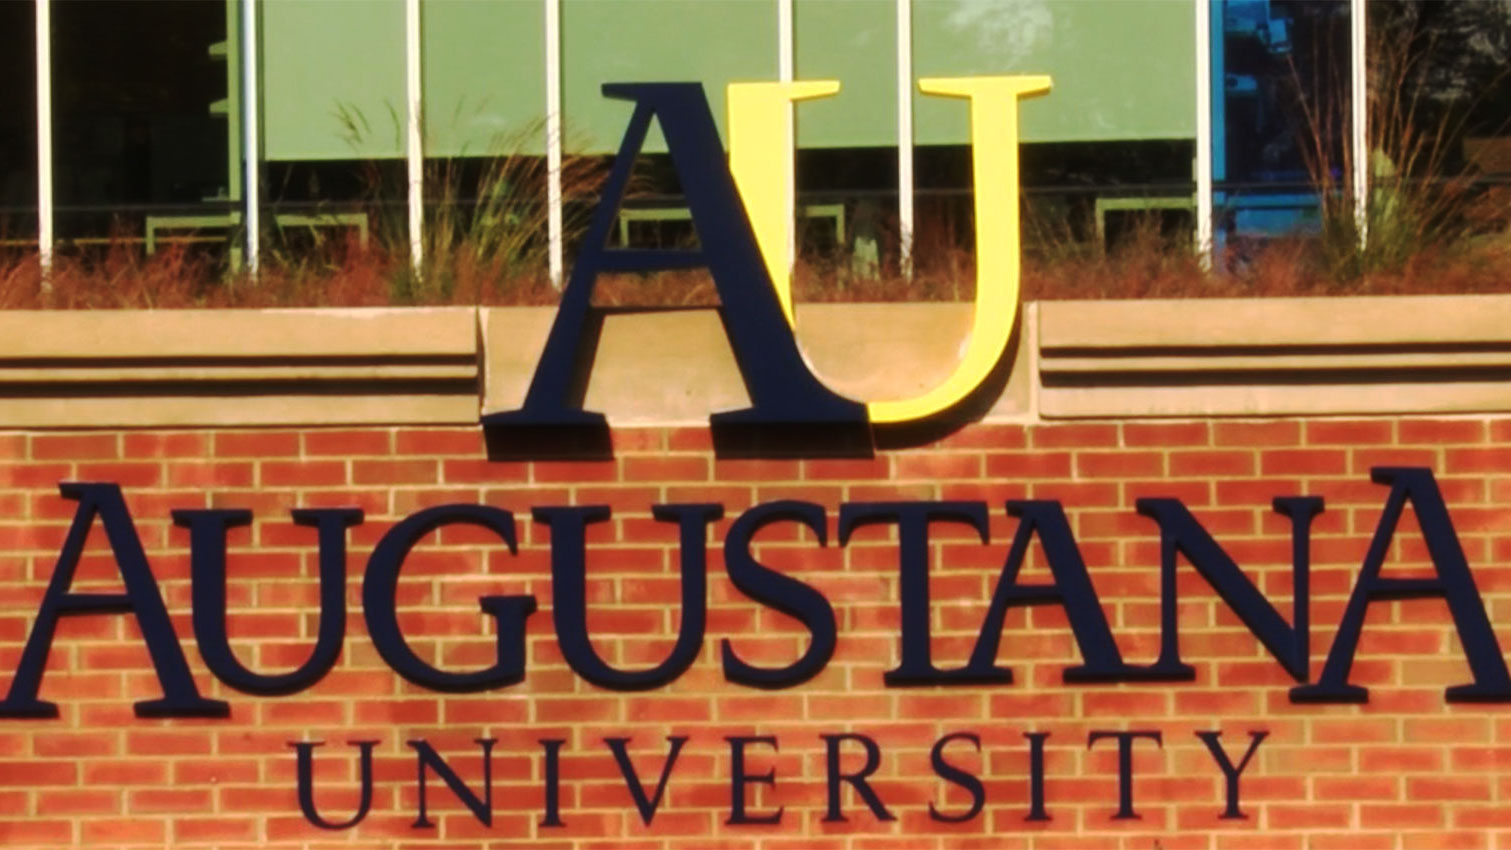 KELO augustana university buildings sioux falls